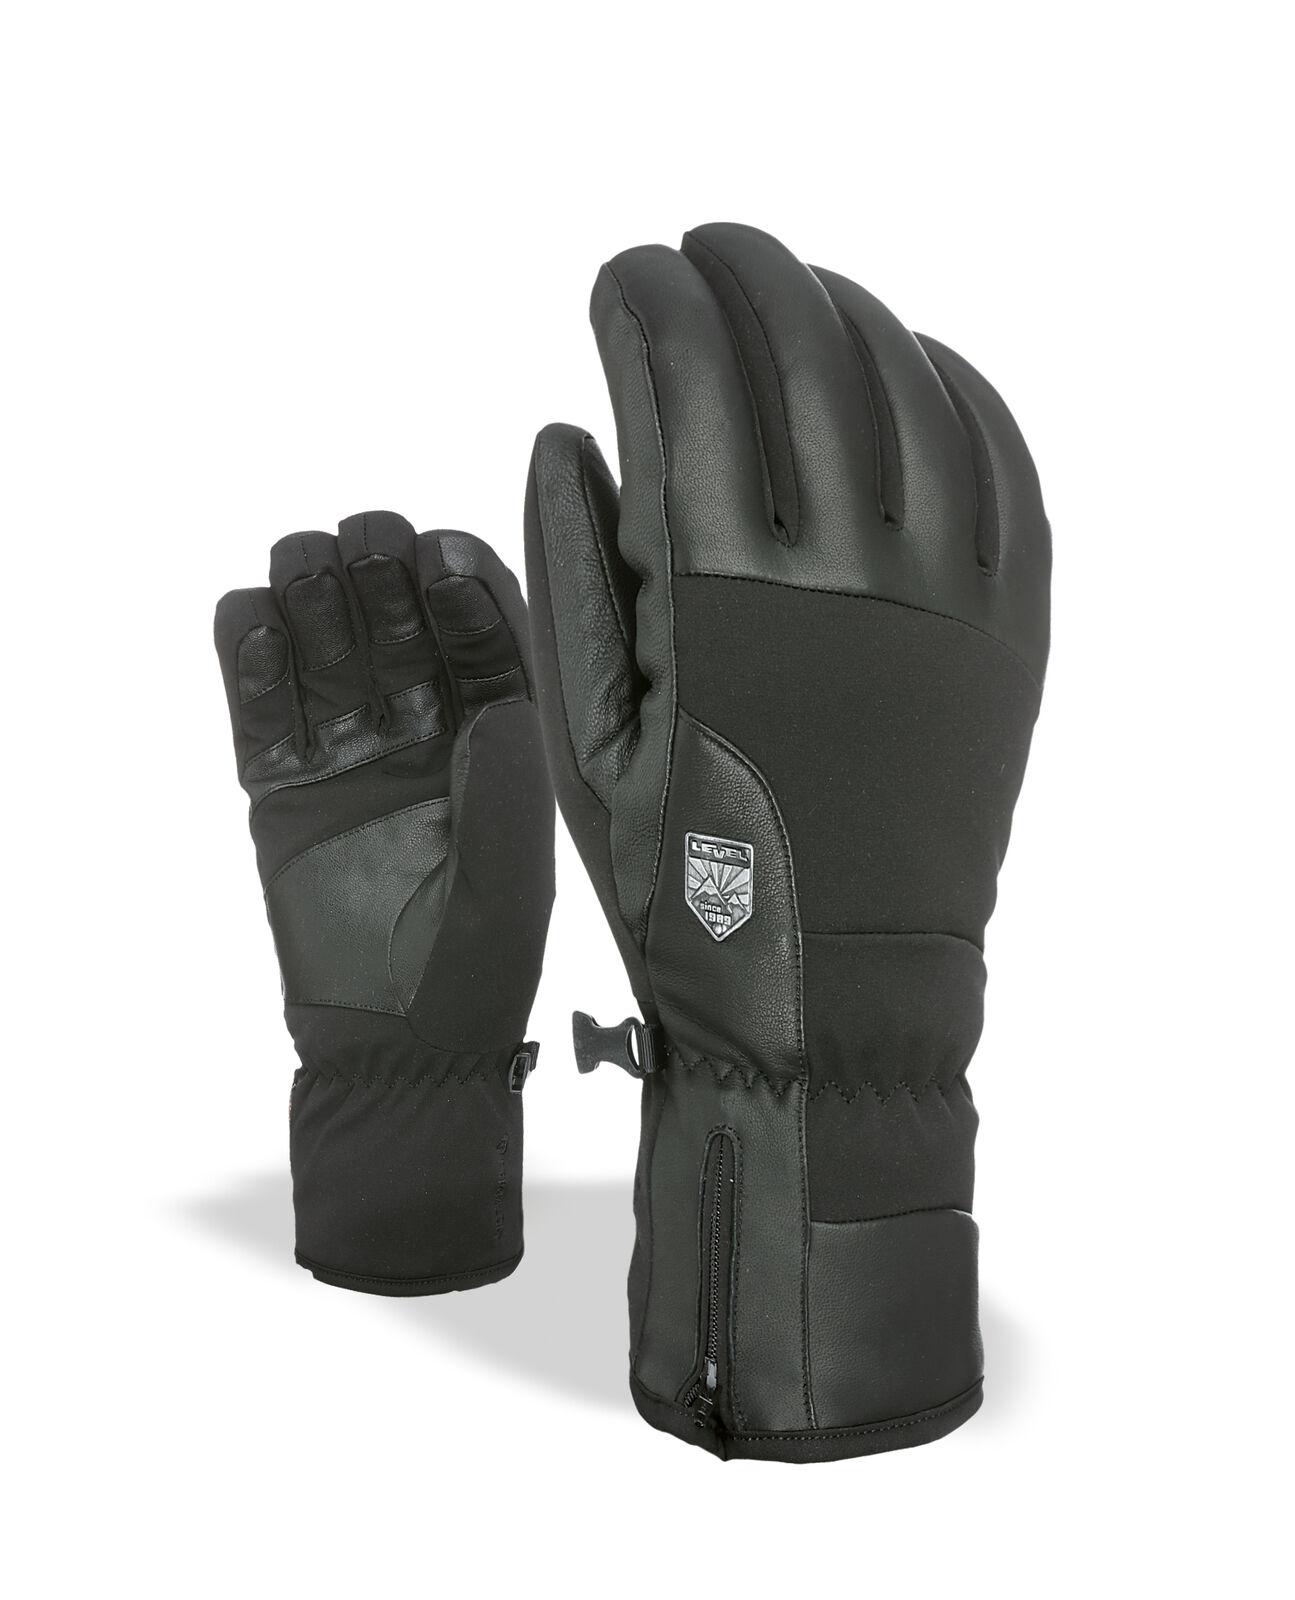 Level Handschuh Sharp black wasserdicht atmungsaktiv wärmend